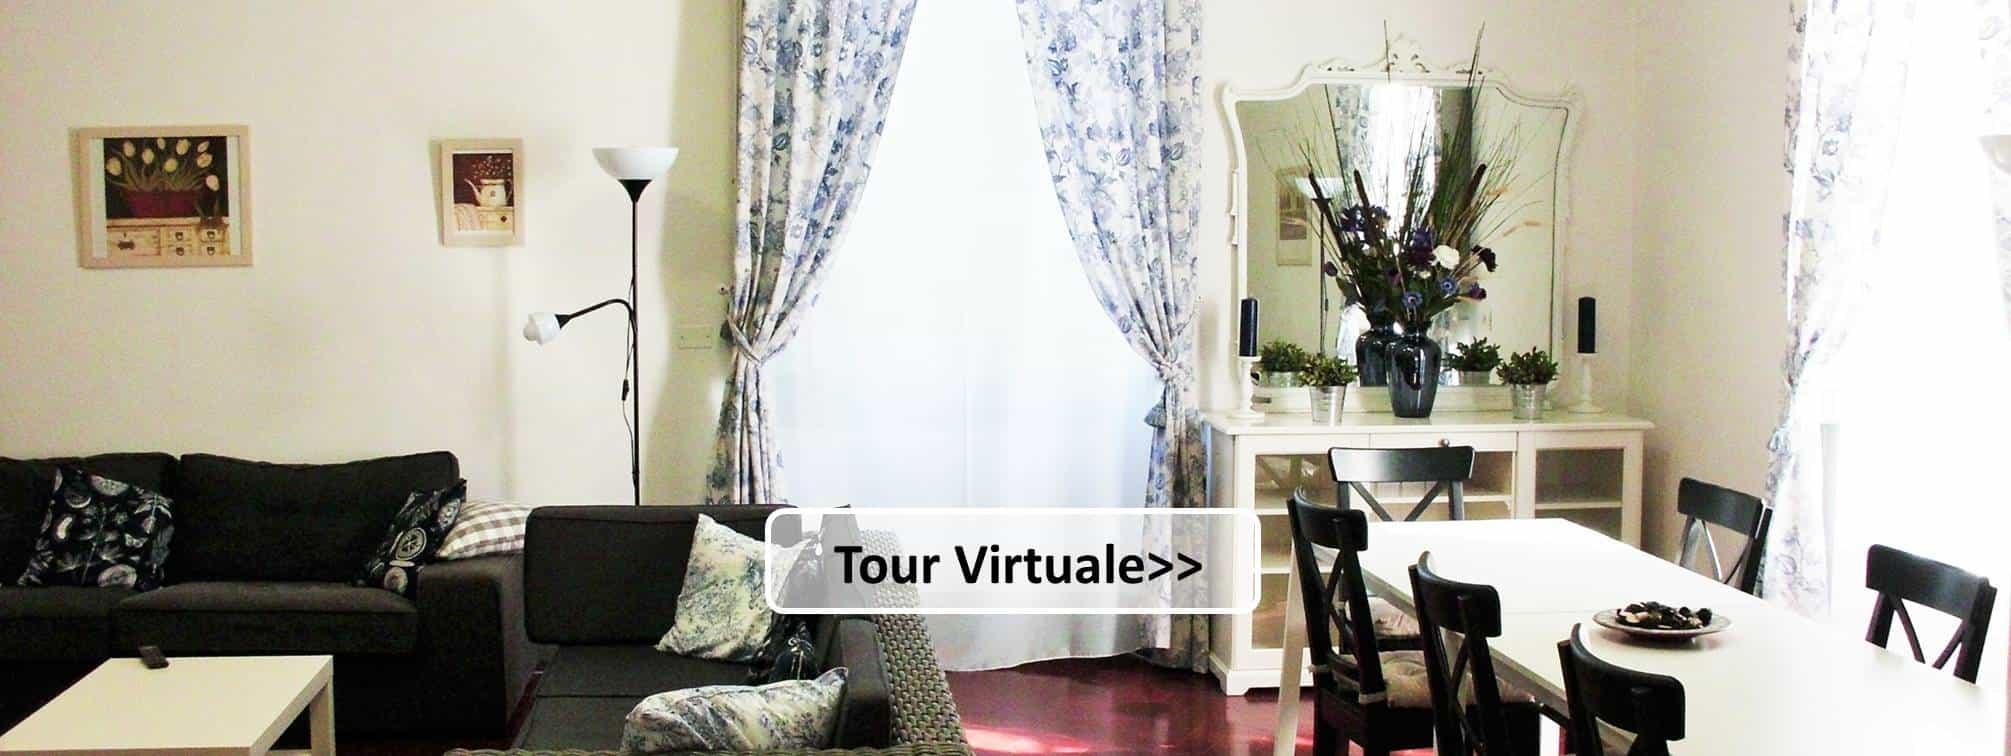 Pensionata Tour Virtuale